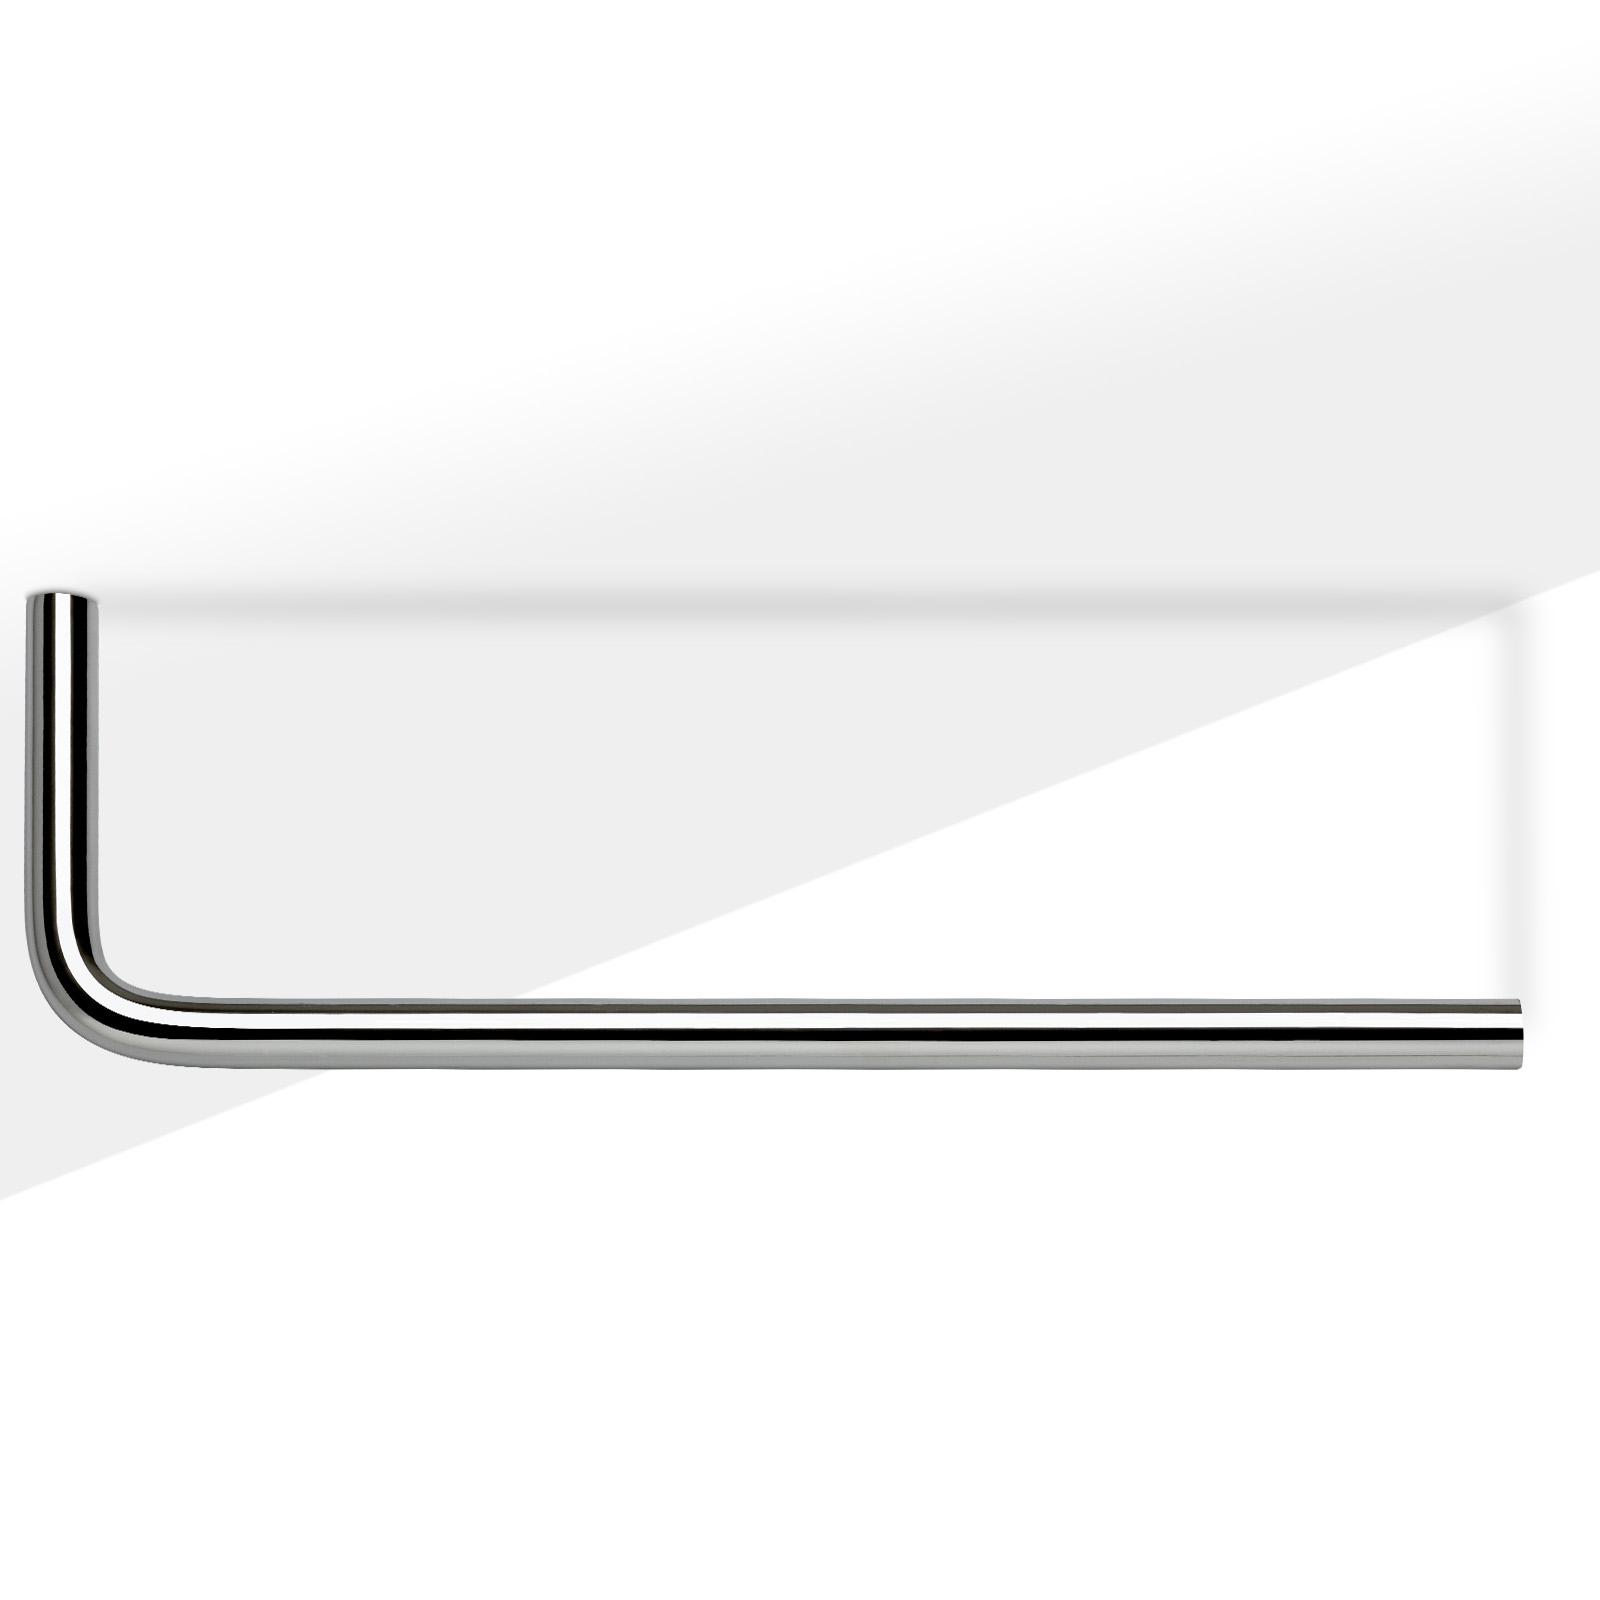 so tech garderobenstange norma ii u form 230 730 mm kleiderstange schrankstange ebay. Black Bedroom Furniture Sets. Home Design Ideas